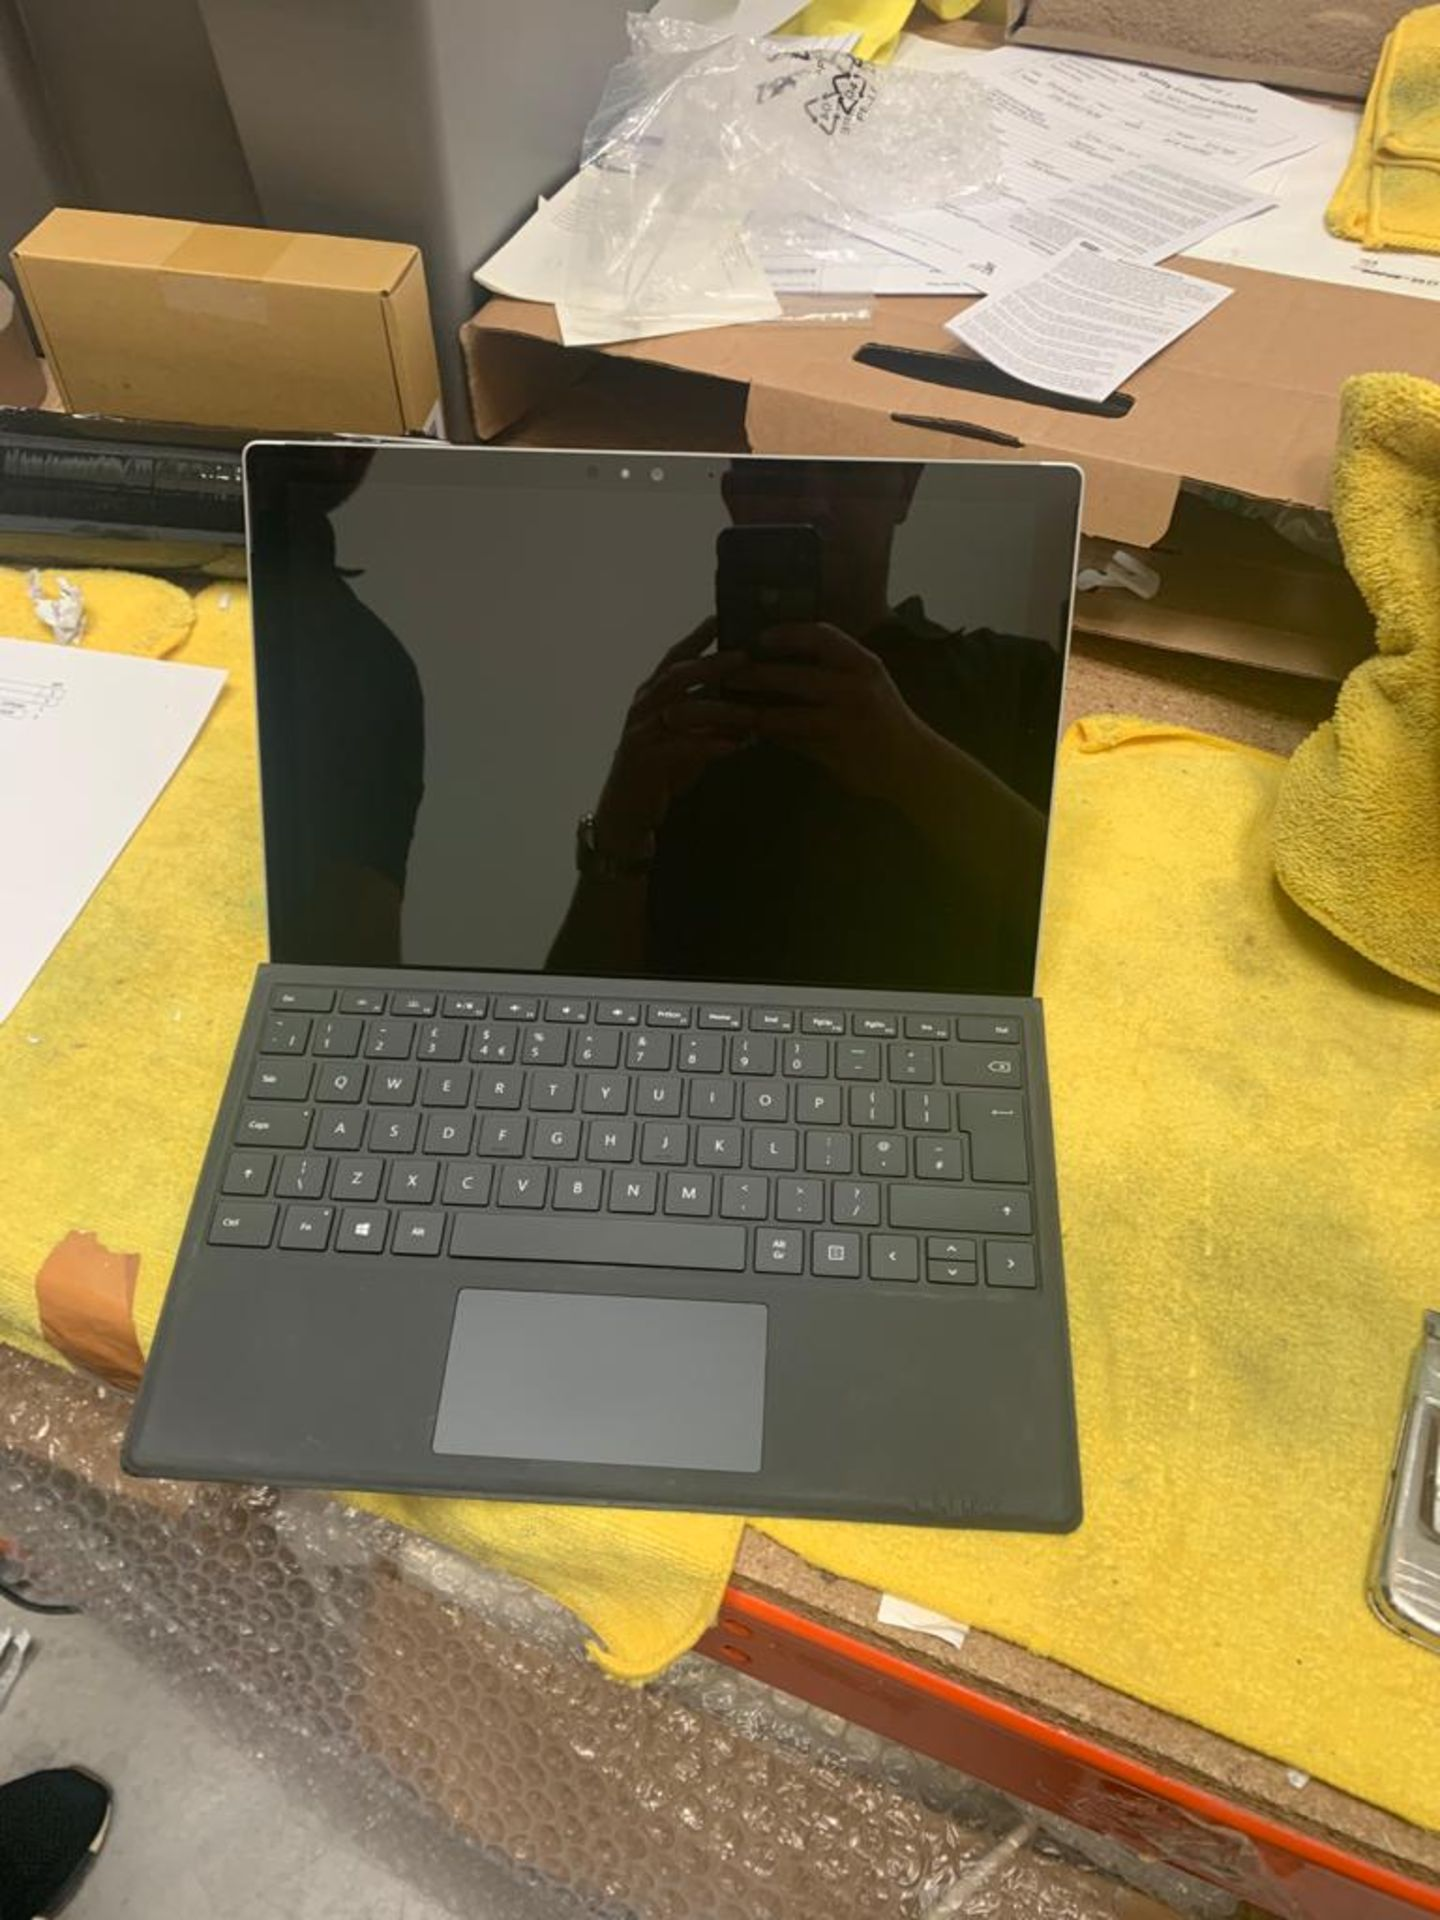 Microsoft Surface Pro 4 - Image 4 of 4